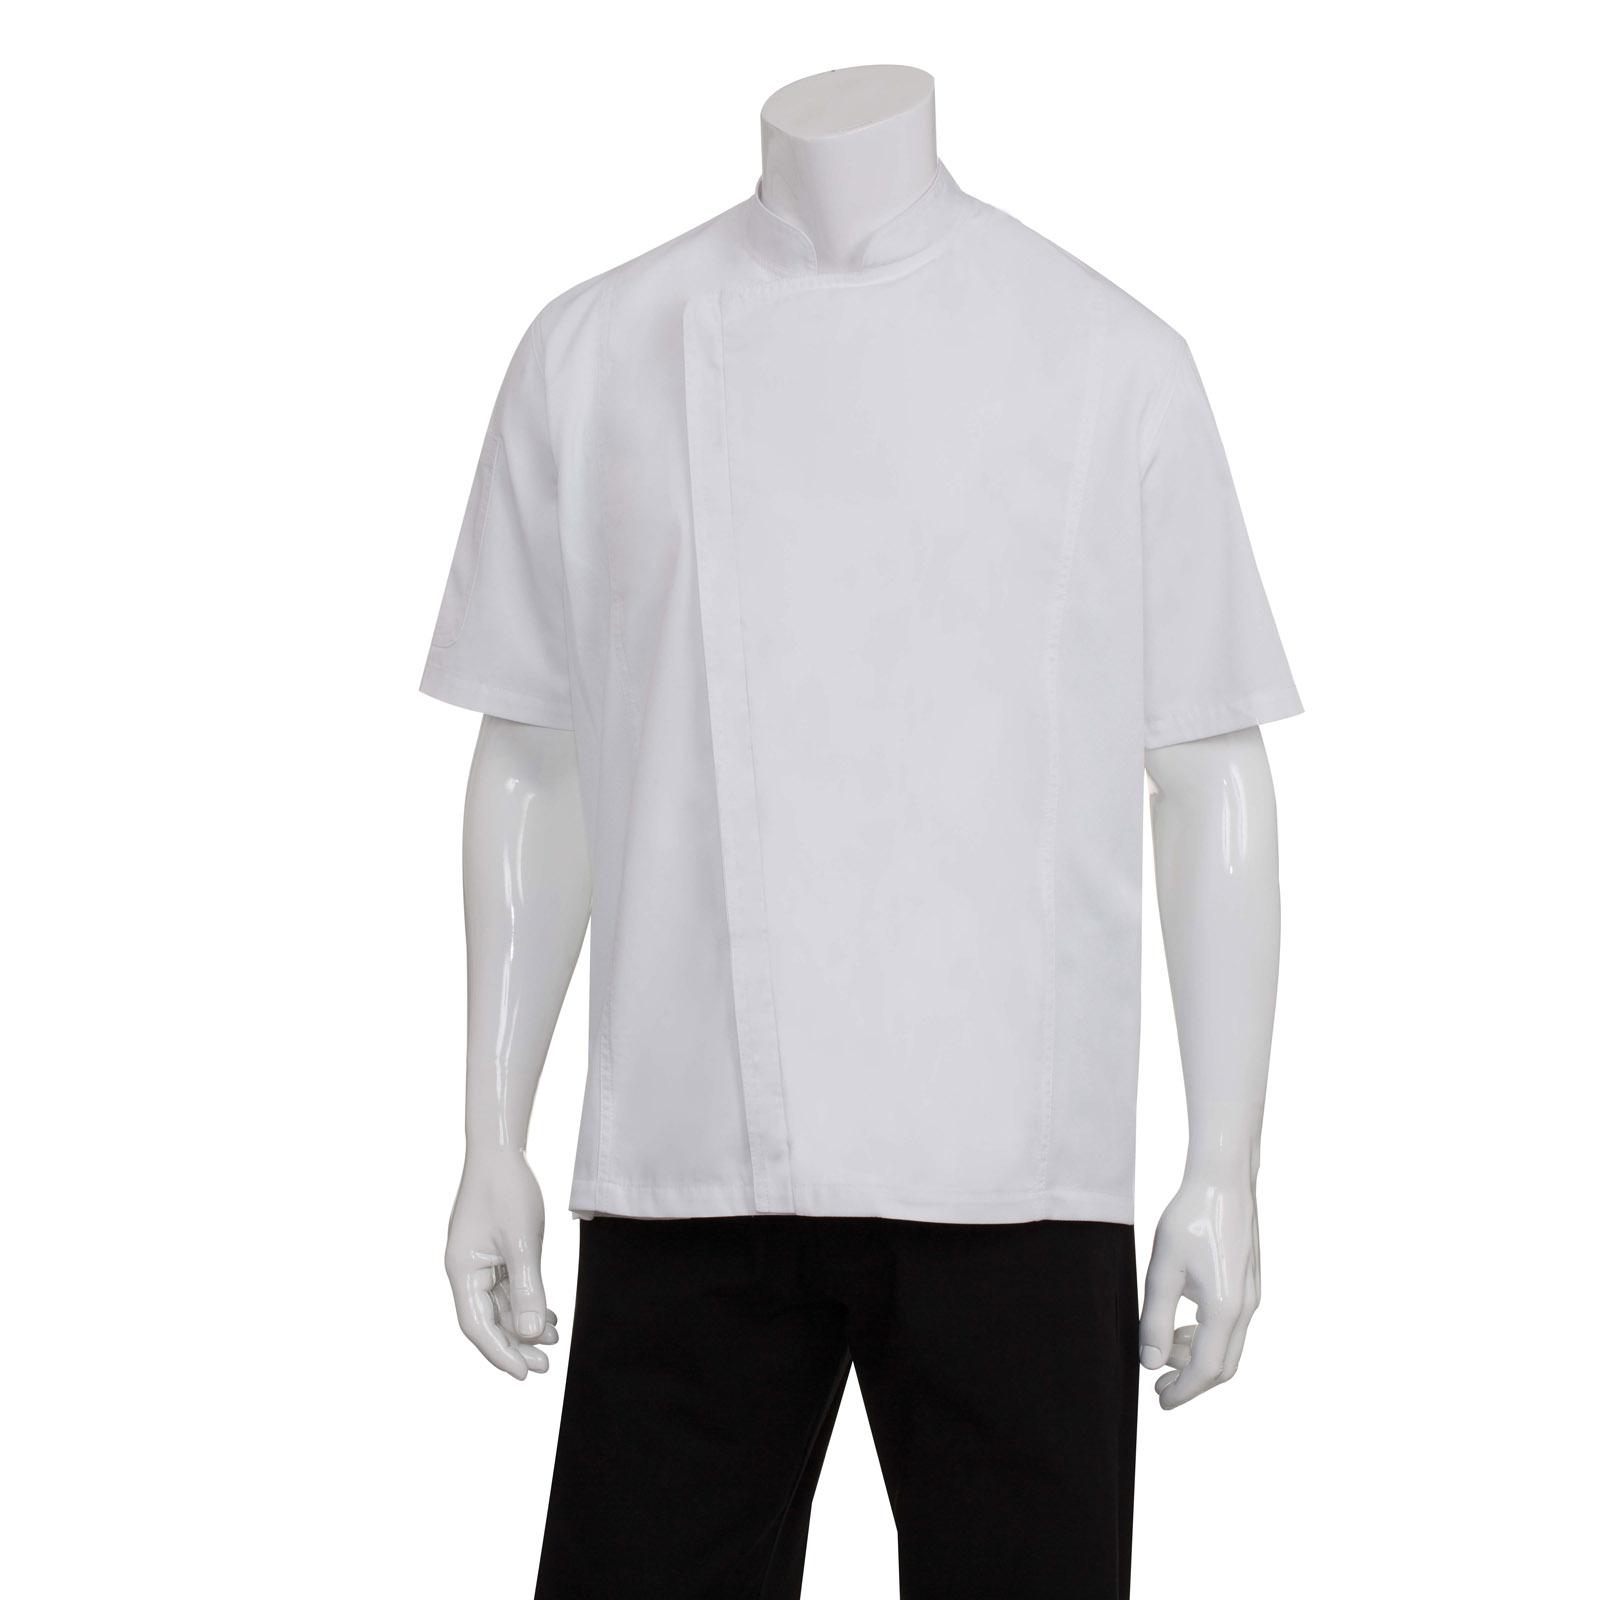 Chef Works BCSZ009WHTXL chef's coat